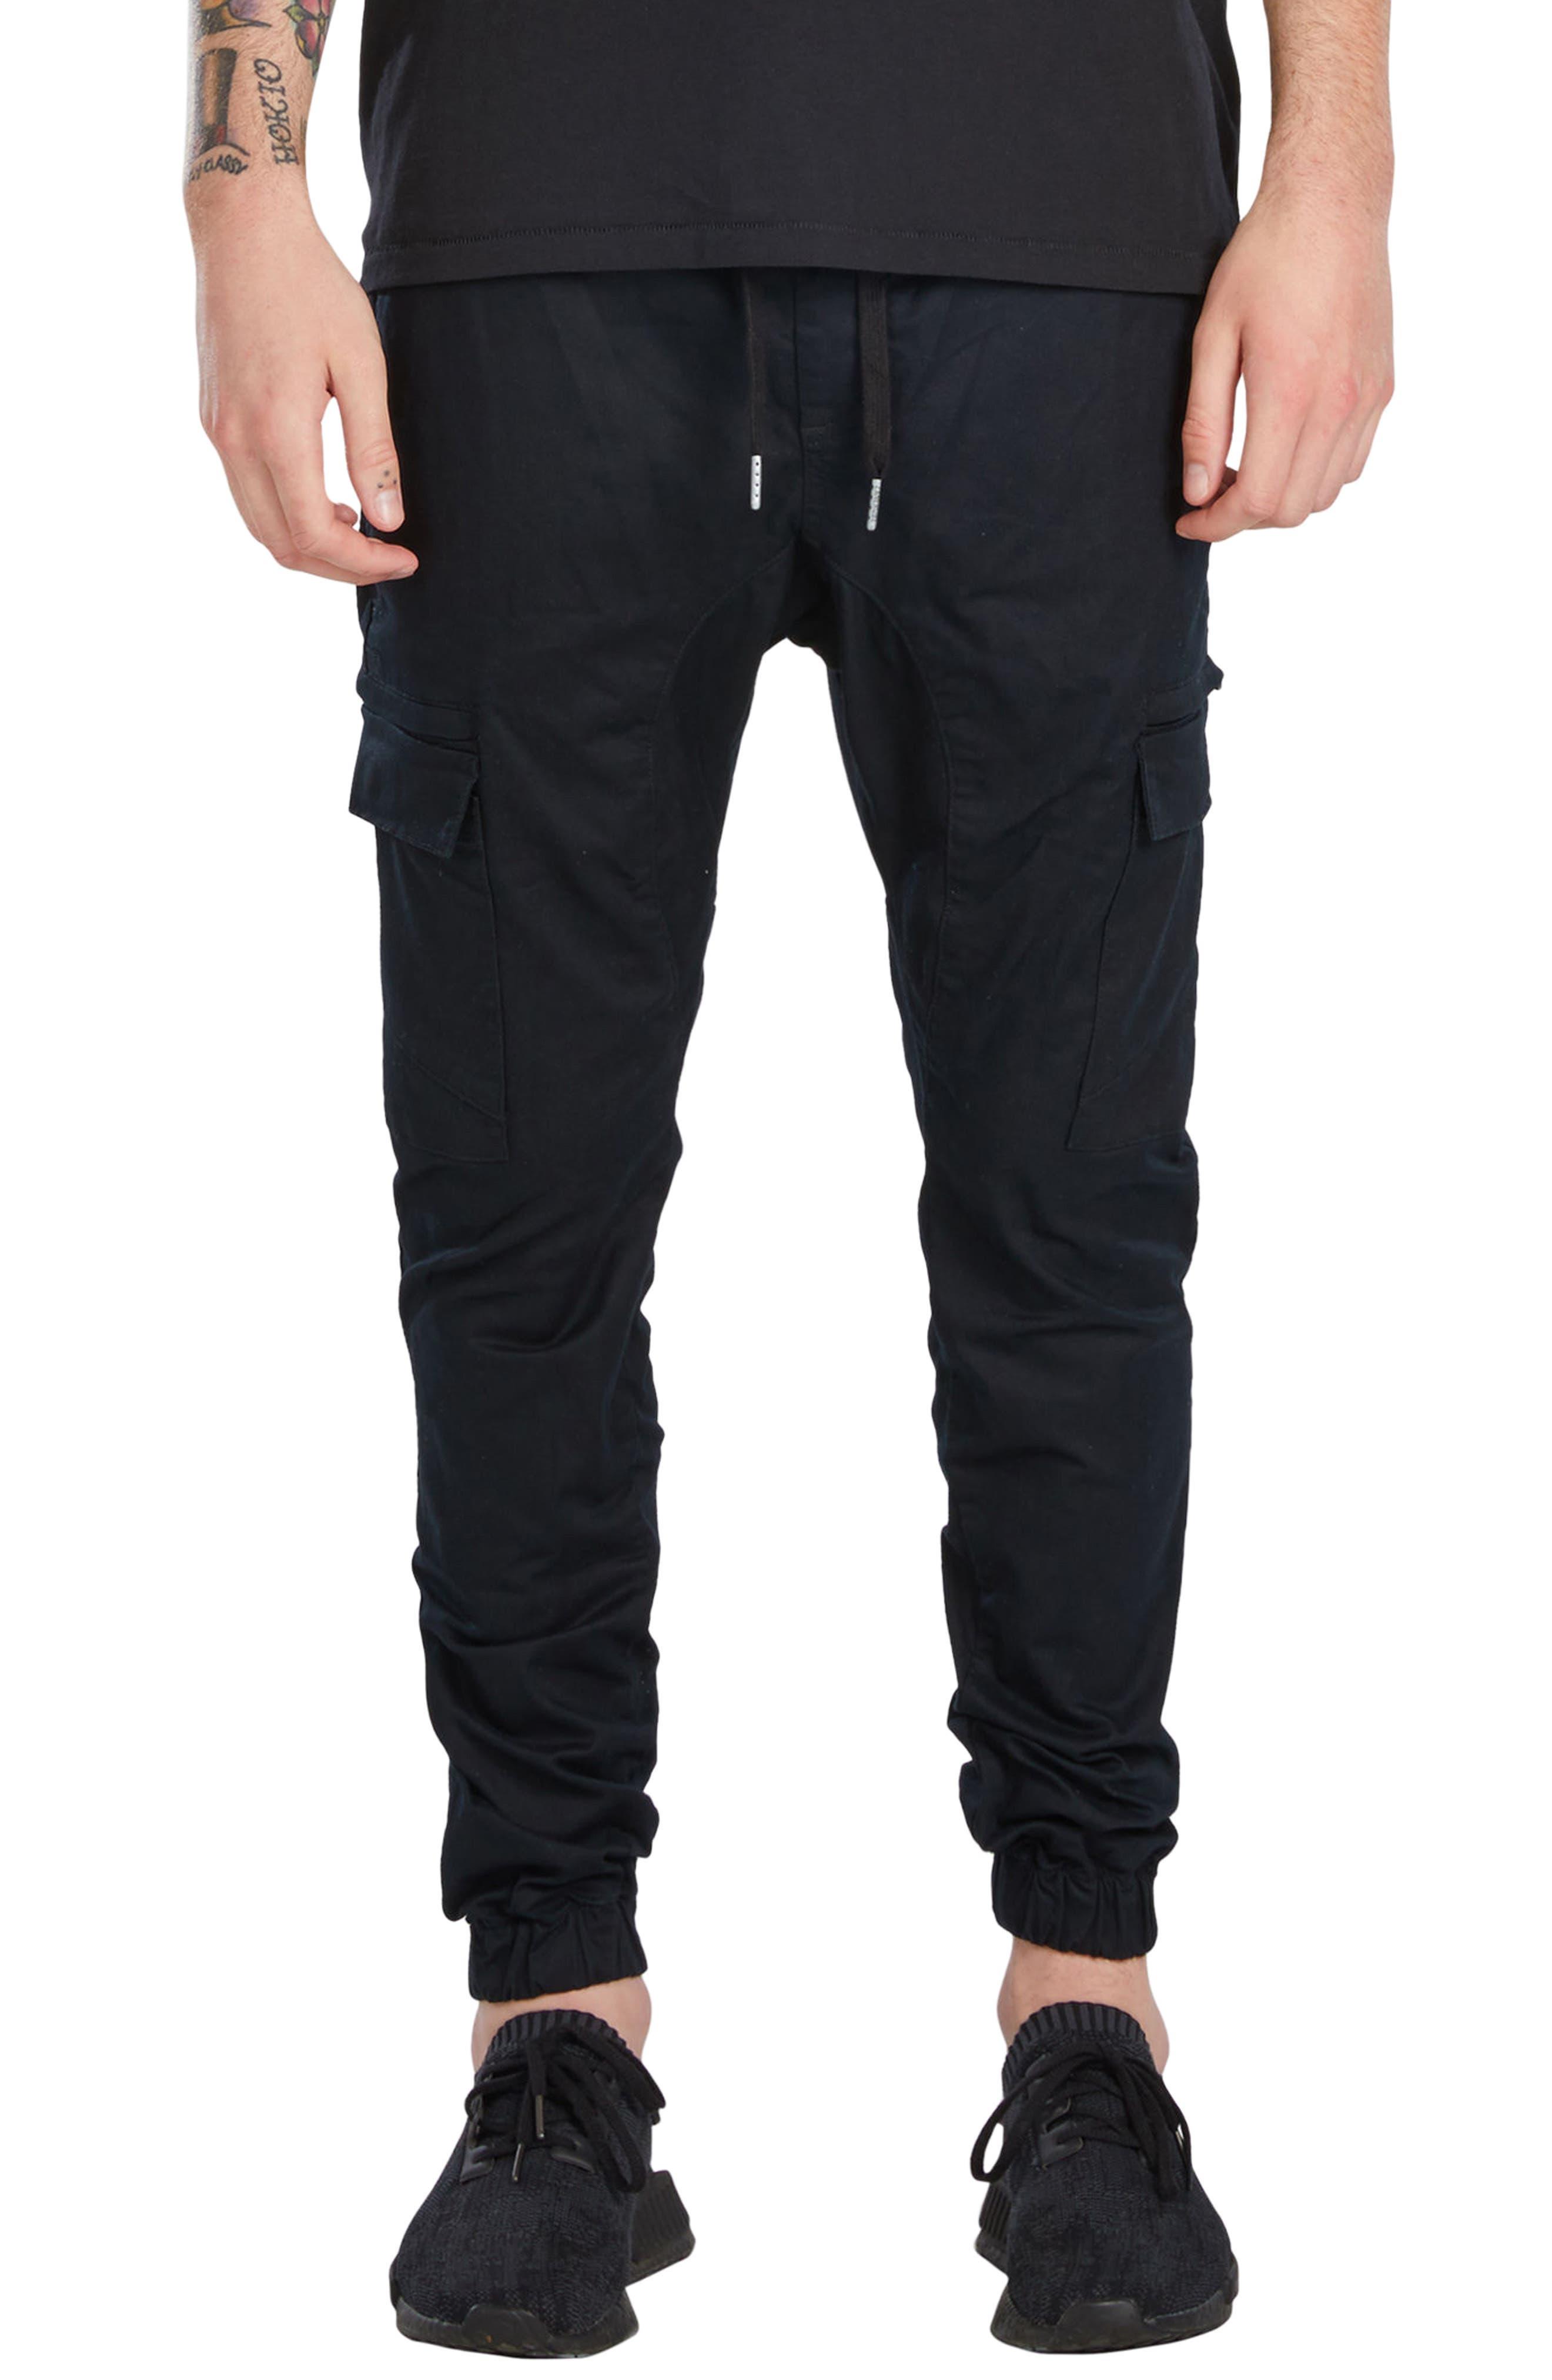 Sureshot Cargo Jogger Pants,                         Main,                         color,